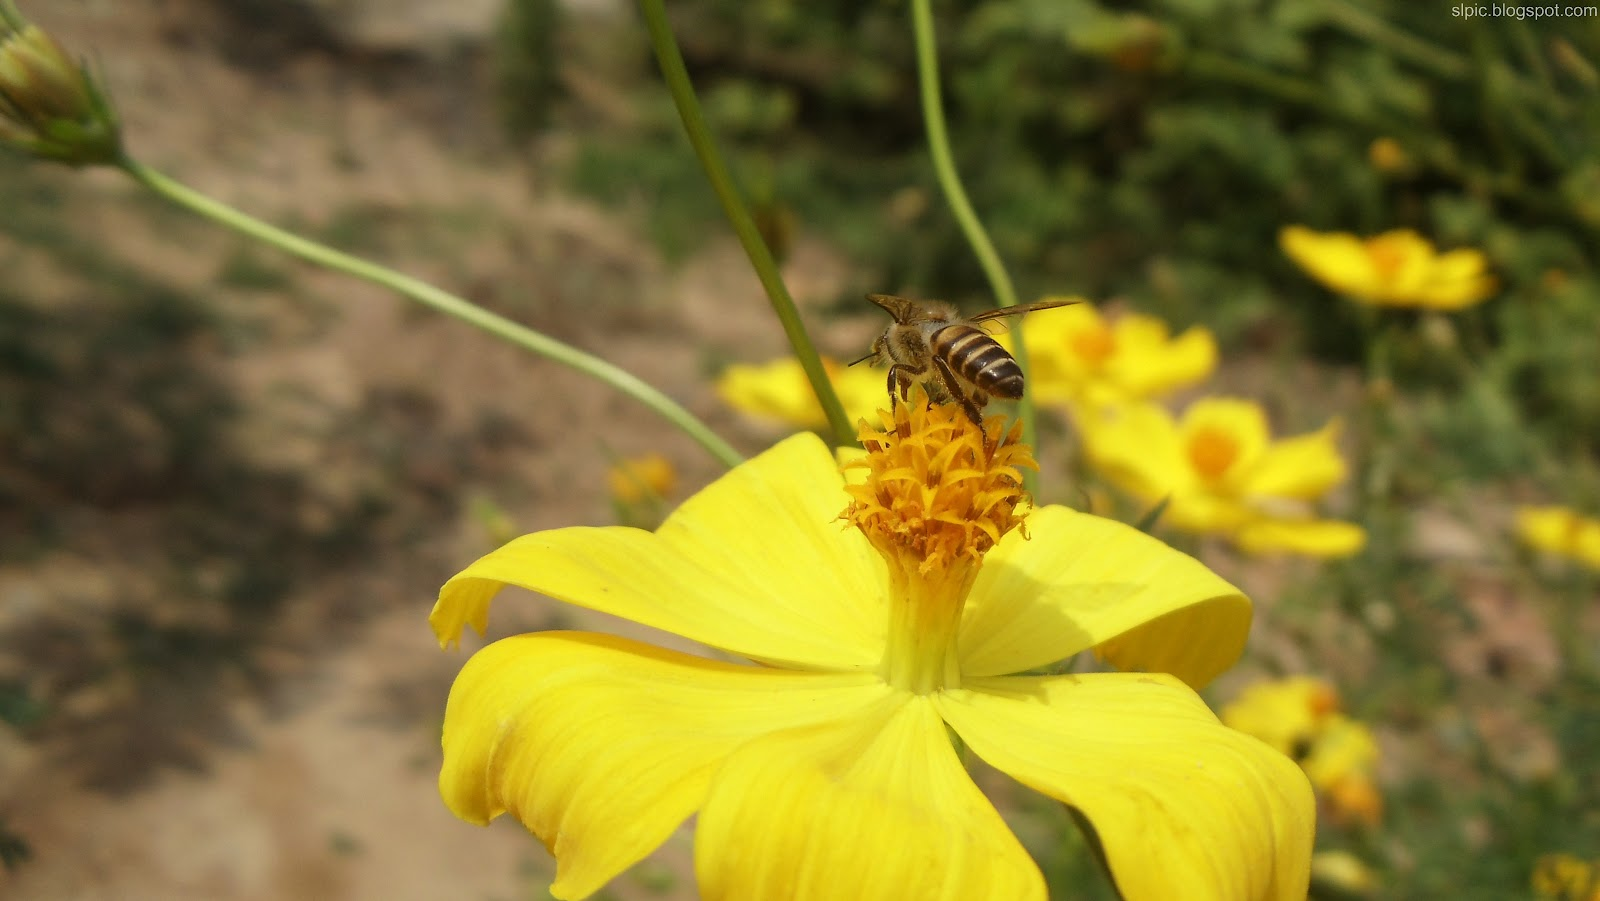 http://4.bp.blogspot.com/-8FKoVKbYnaU/UBInEbJ5tfI/AAAAAAAAKko/FNt4N8hvDYQ/s1600/Srilanka+Various+Flowers+And+Nature++(2).JPG